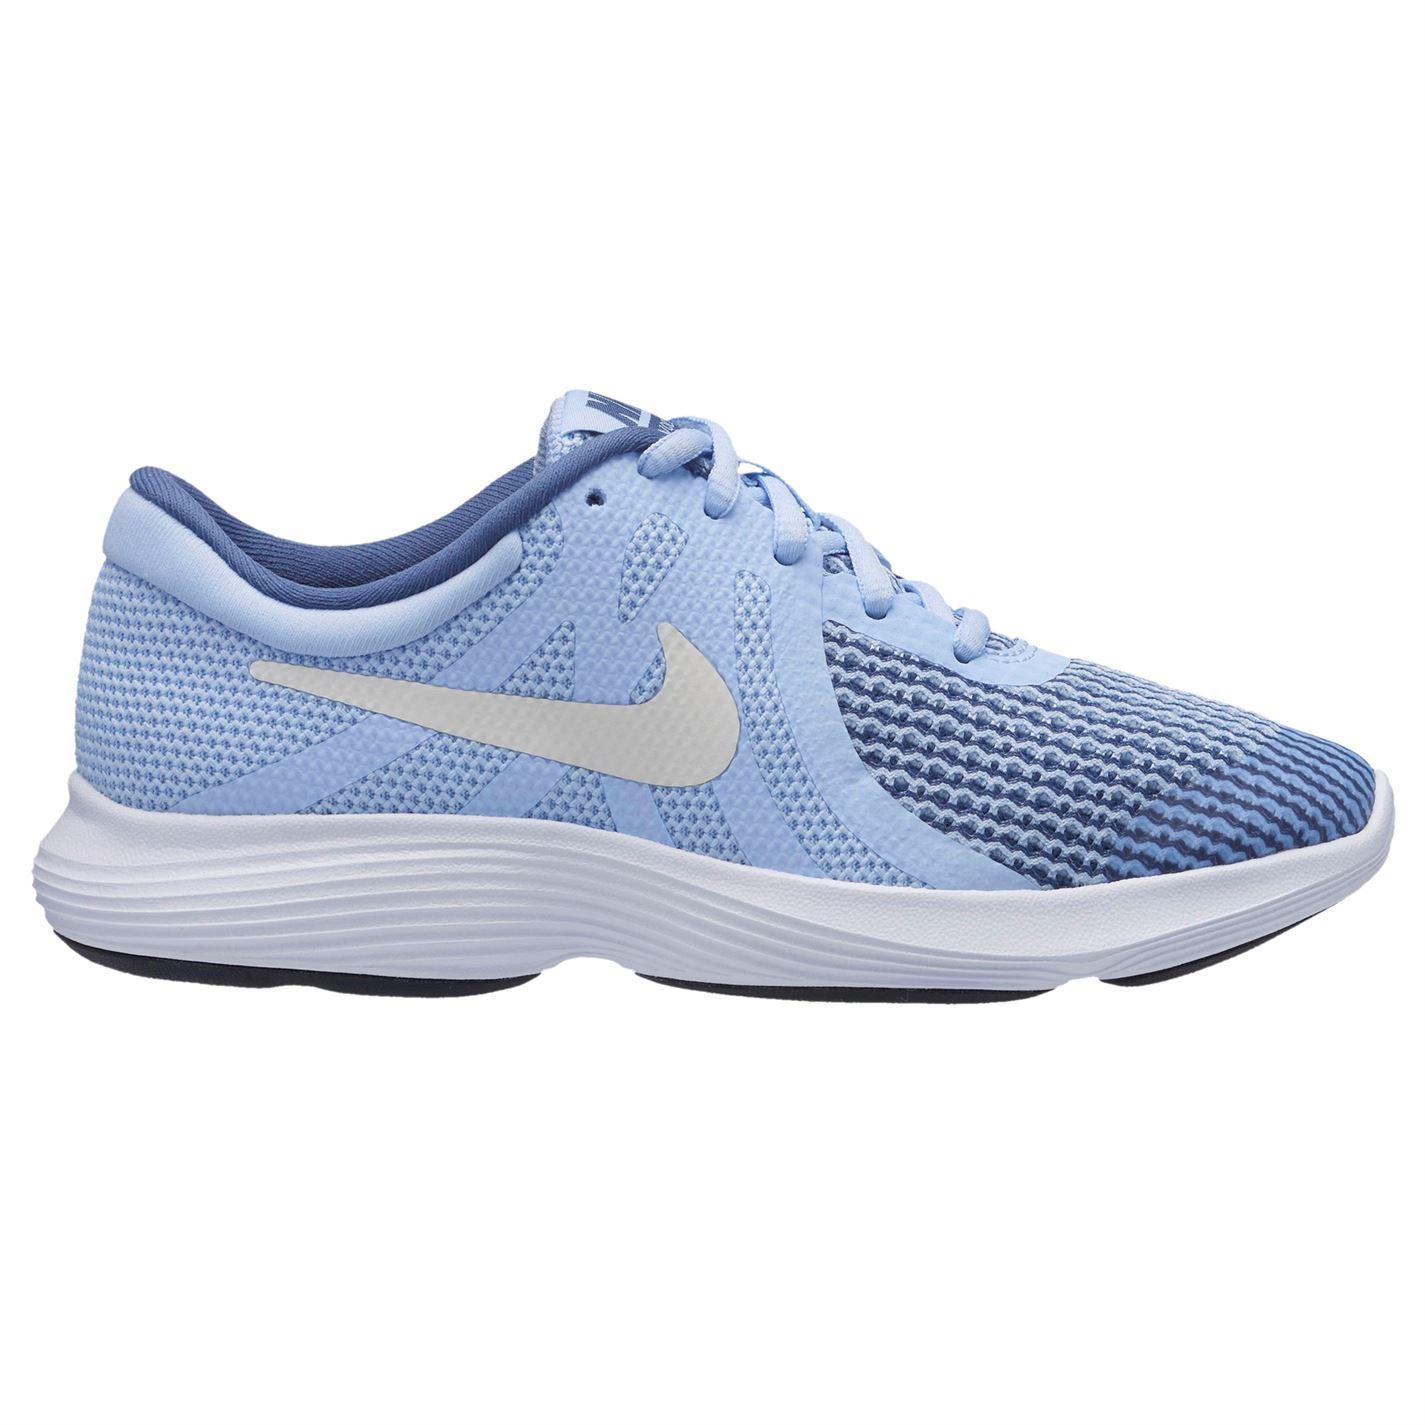 f6f66422e4dfc ... Nike Revolution 4 Trainers Junior Girls Blue White Shoes Footwear ...